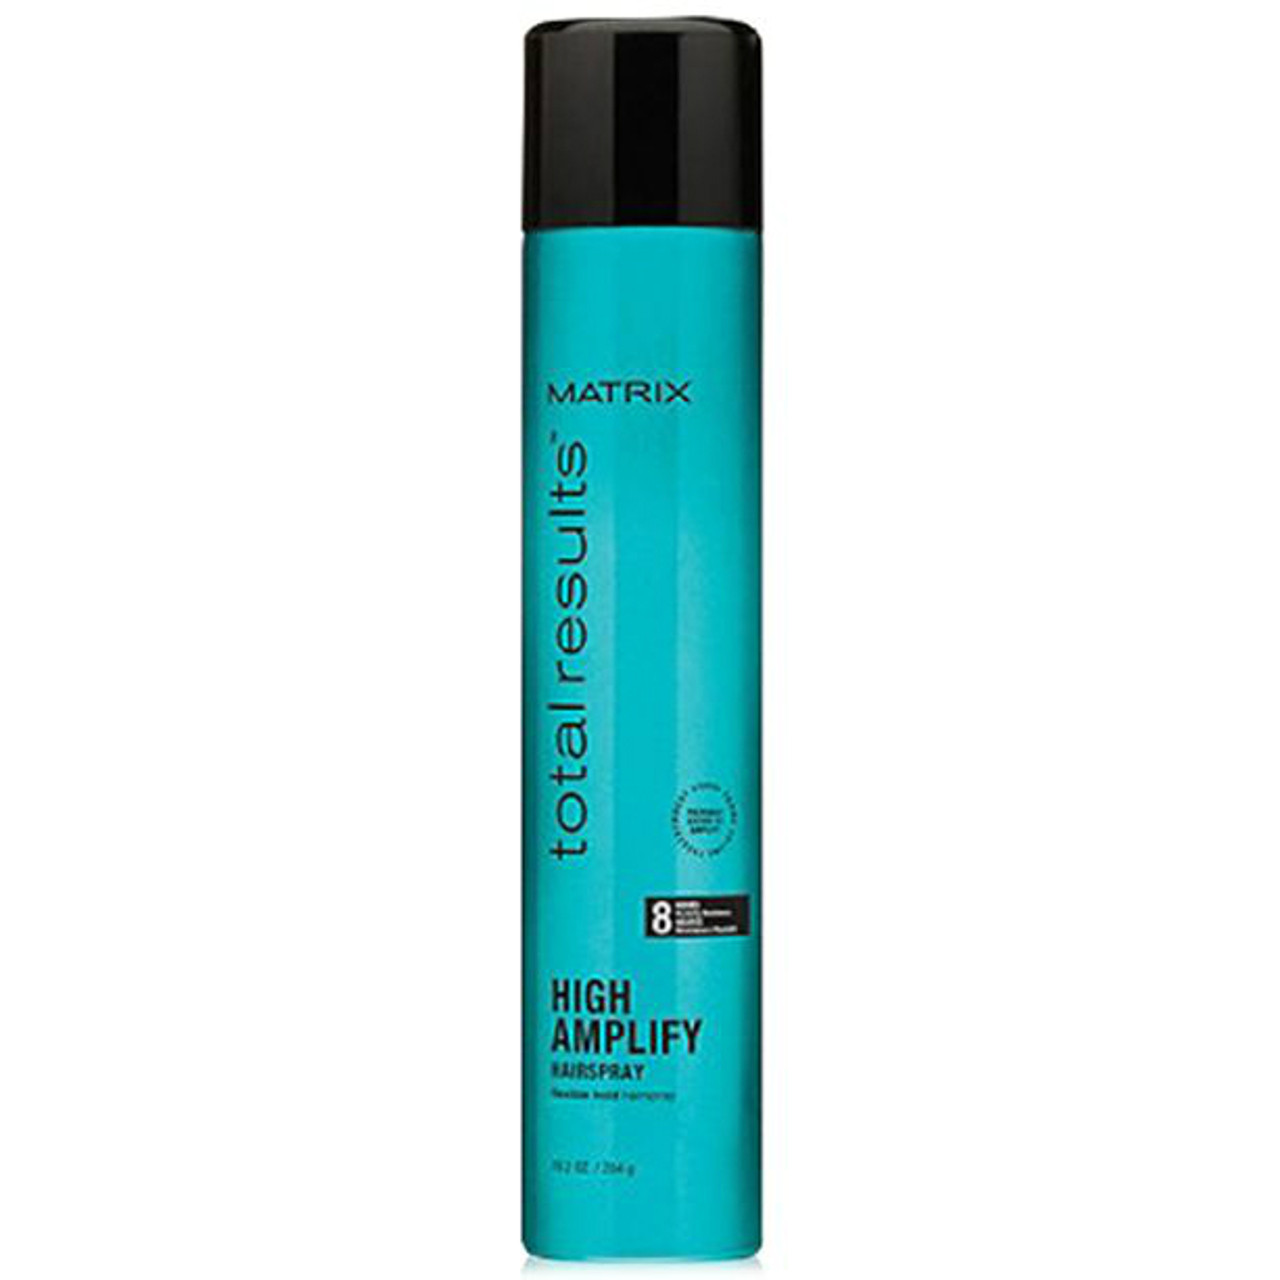 Matrix Total Results High Amplify Hair Spray 11 oz